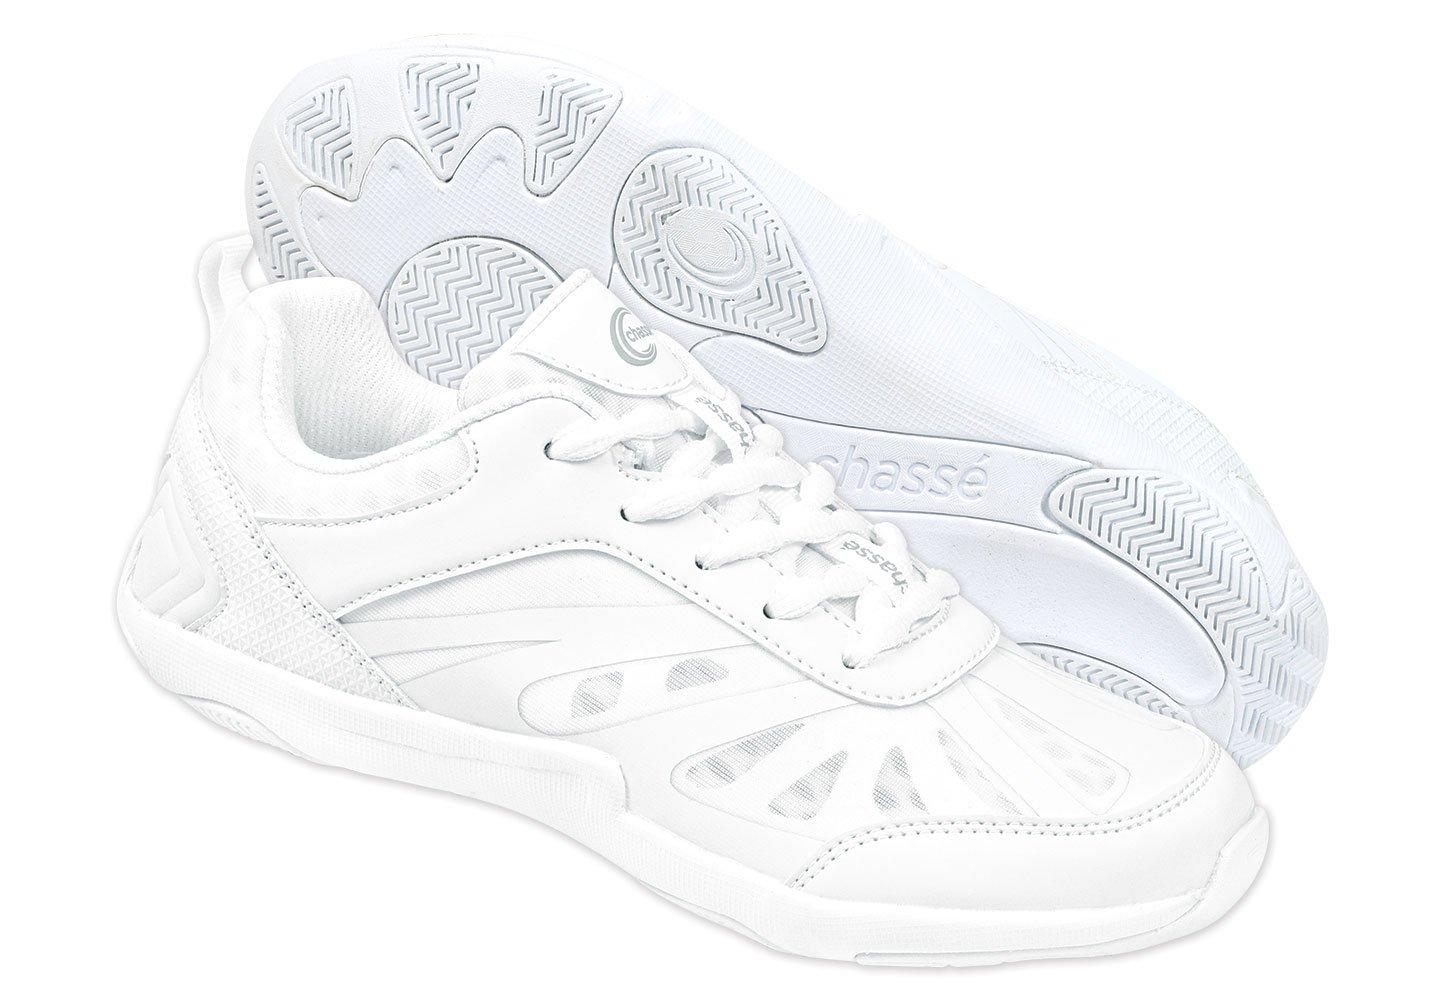 Amazon.com: Chasse: Shoes